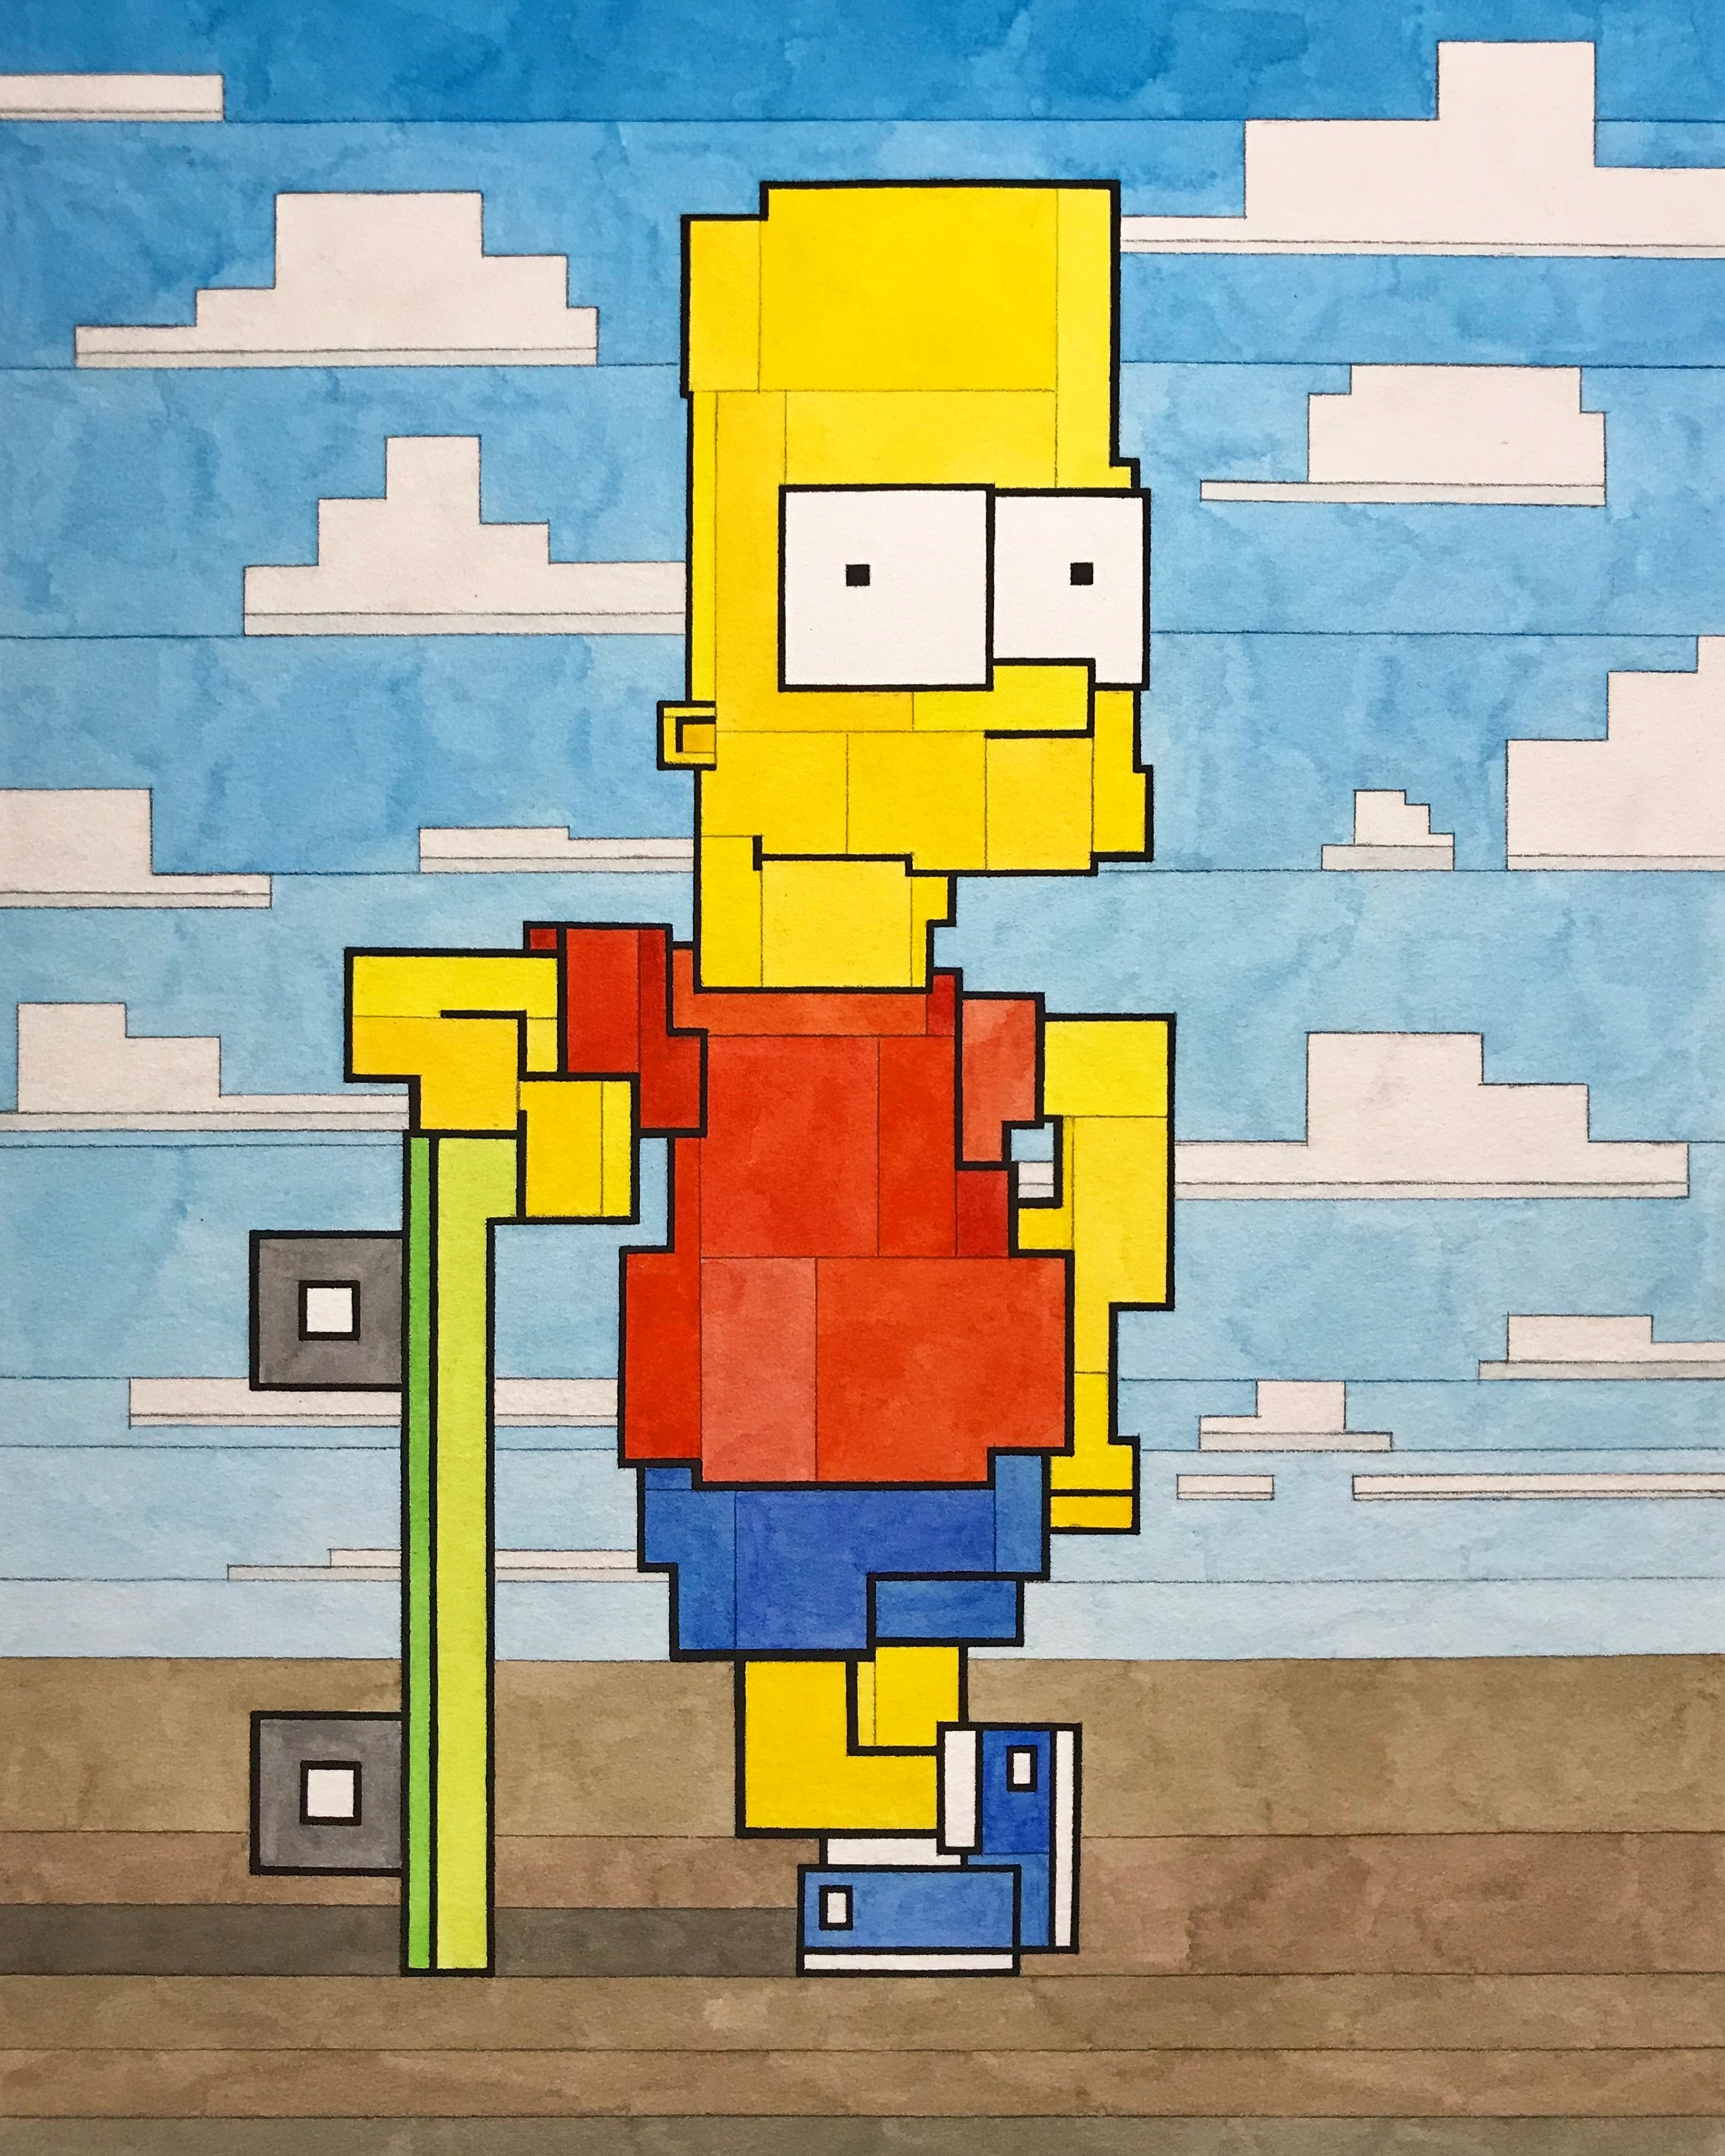 Lister – Bart Simpson